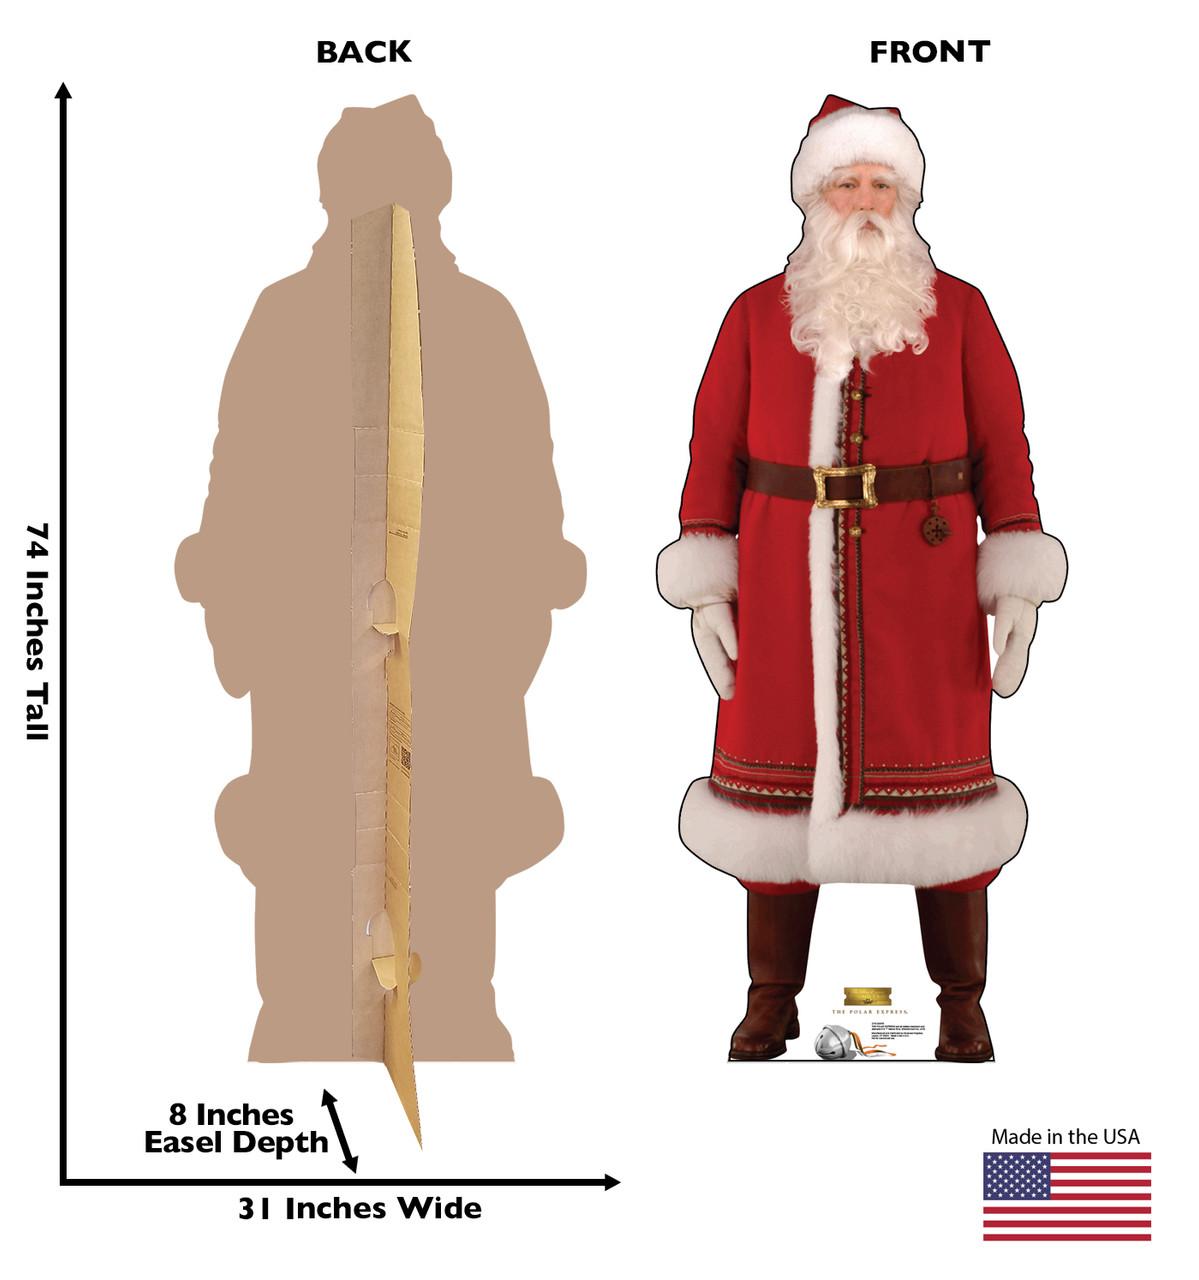 Santa - The Polar Express - Cardboard Cutout